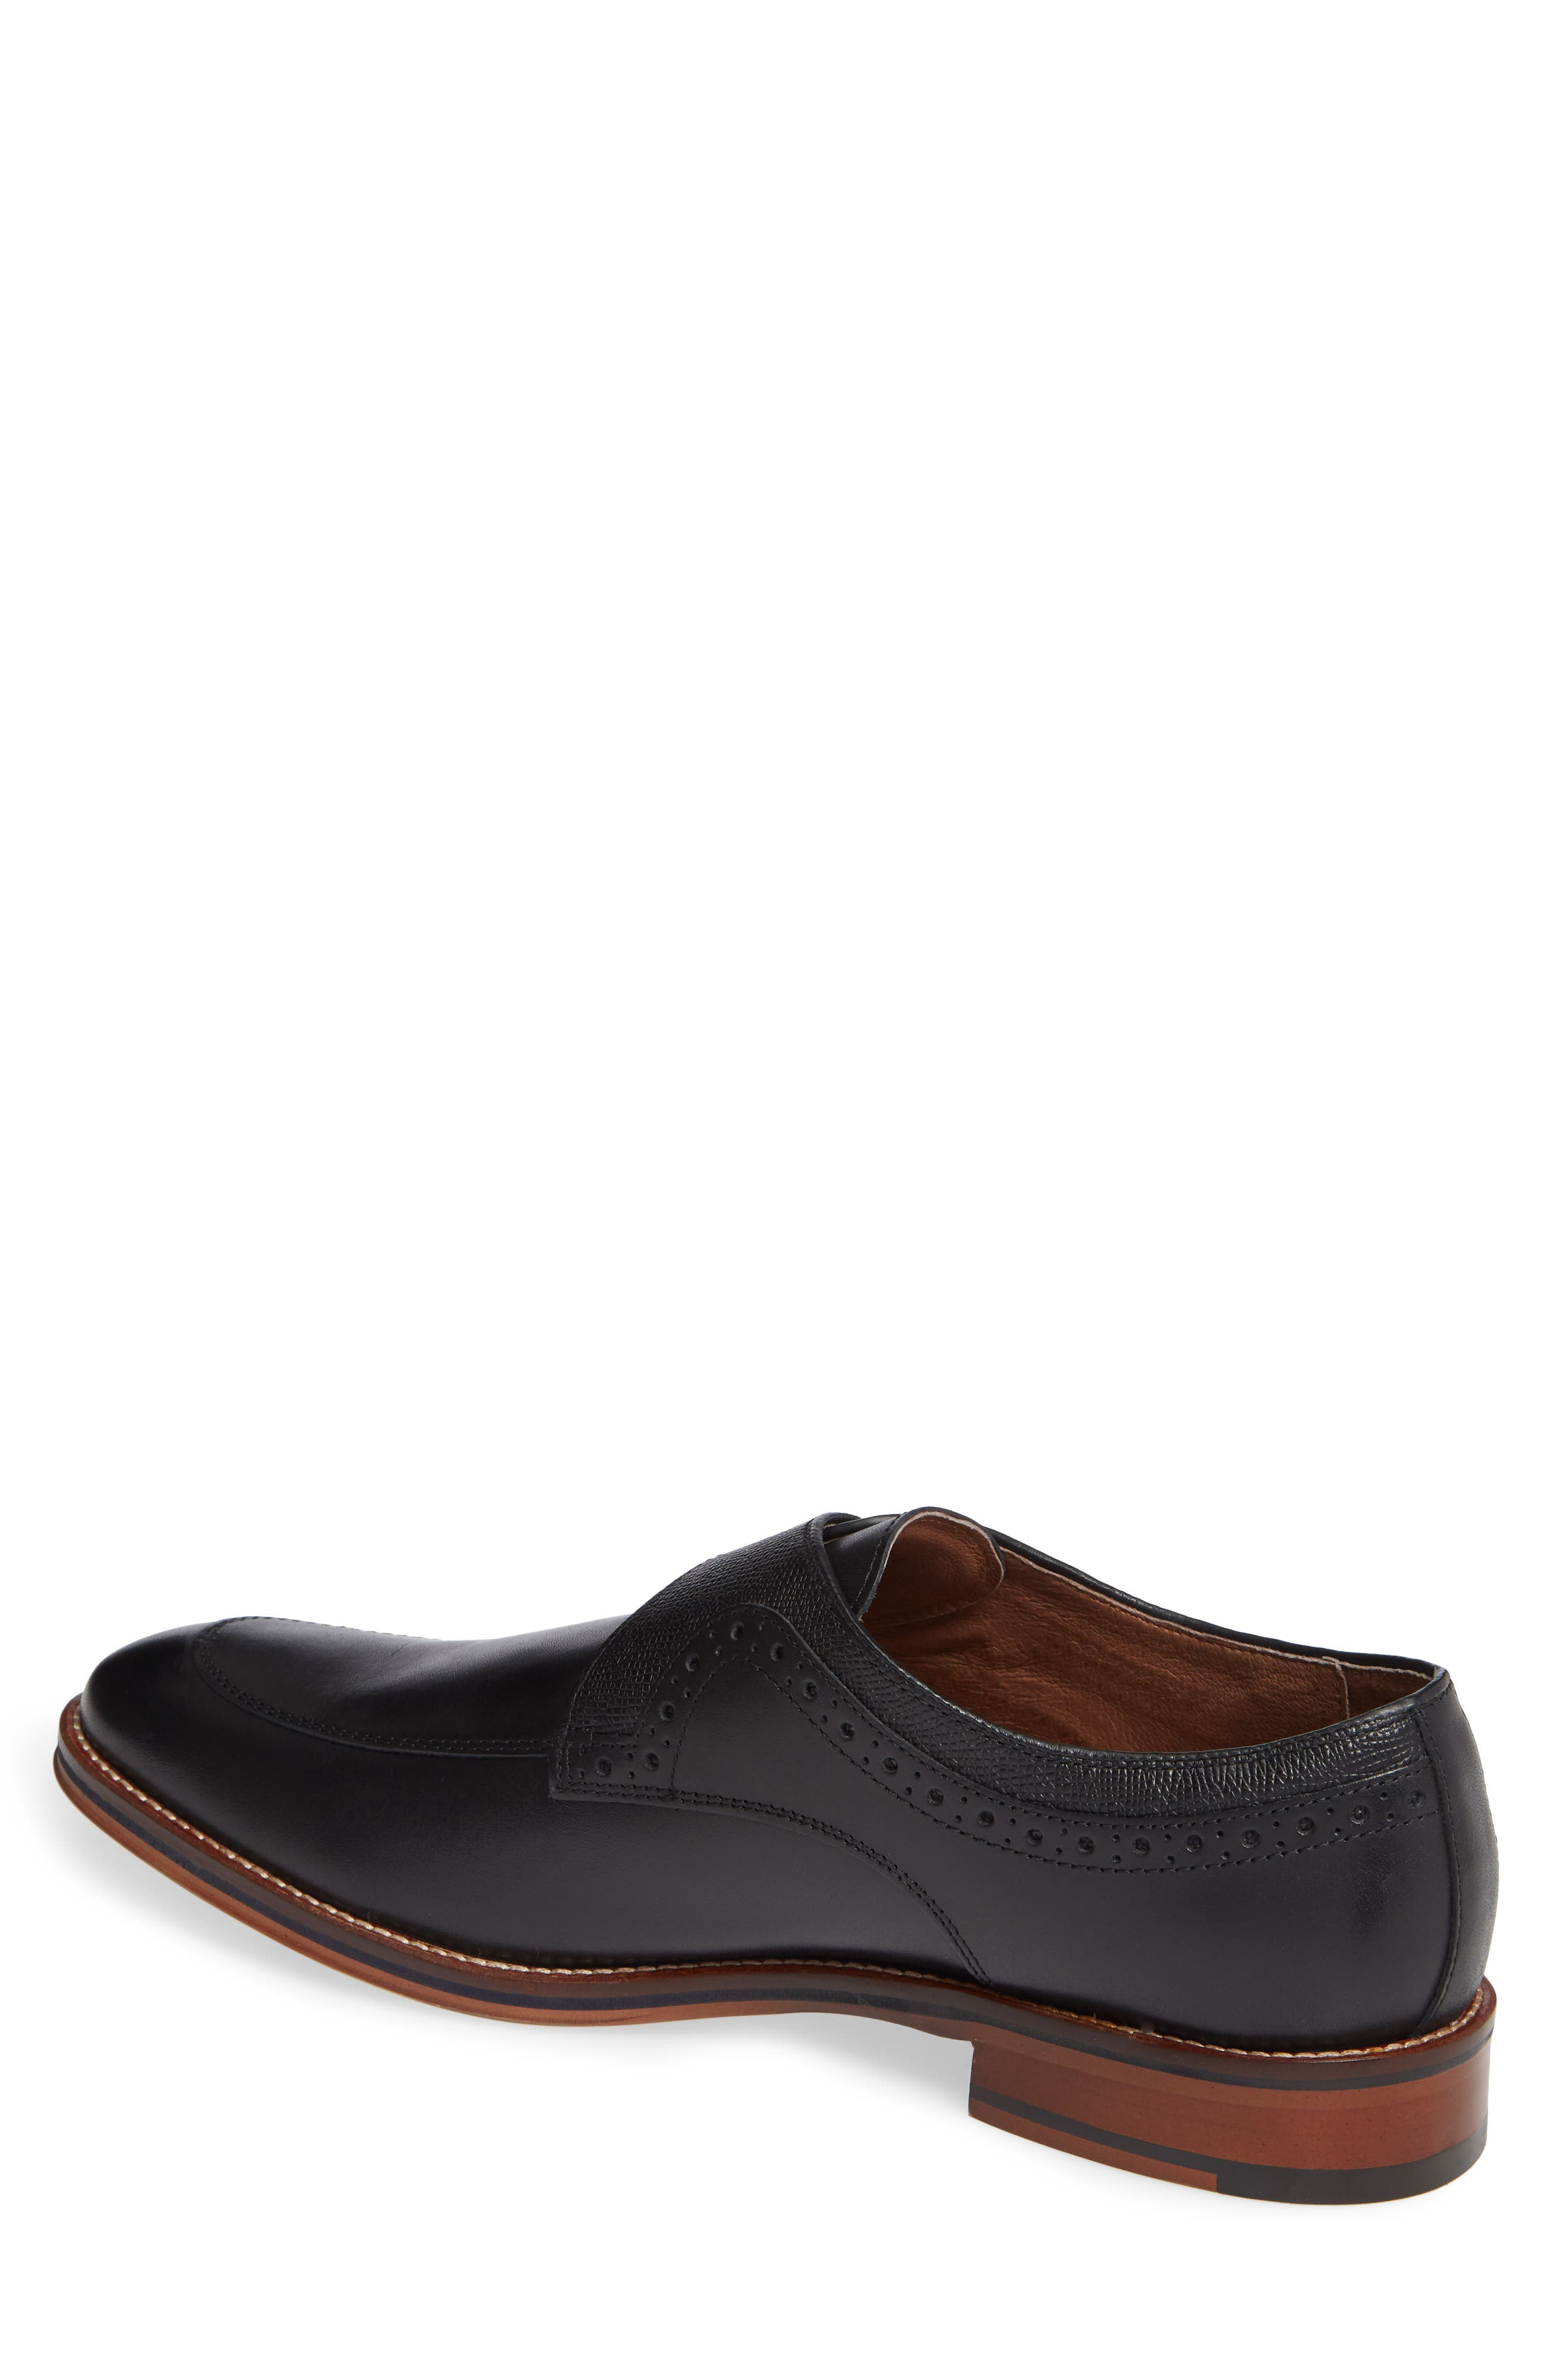 JOHNSTON & MURPHY, Conard Monk Strap Shoe, Alternate thumbnail 2, color, BLACK LEATHER